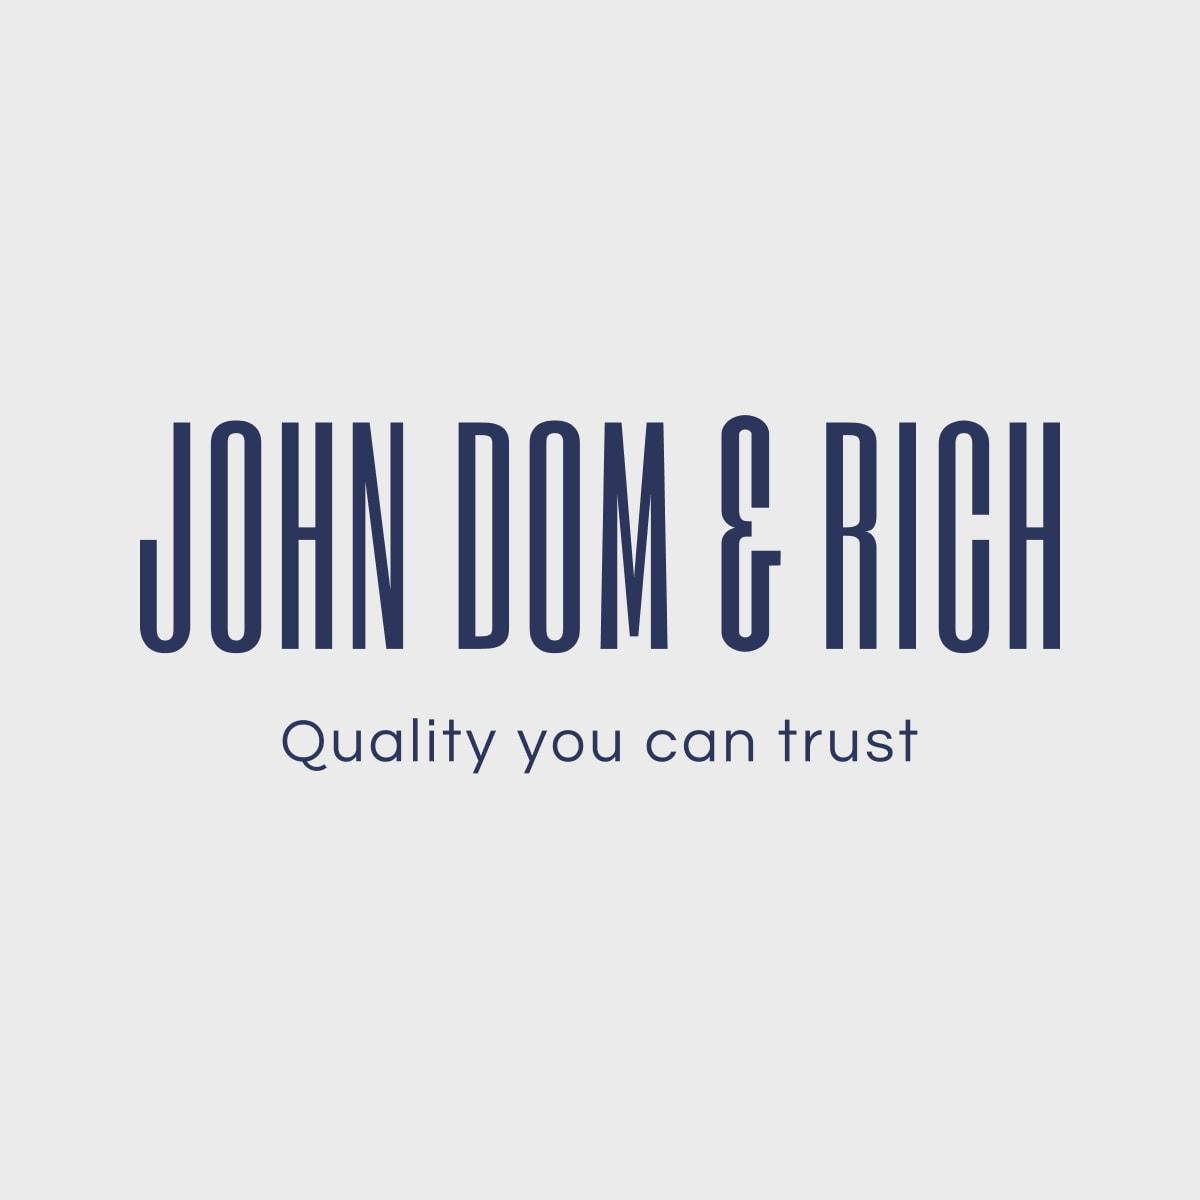 John Dom & Rich  logo